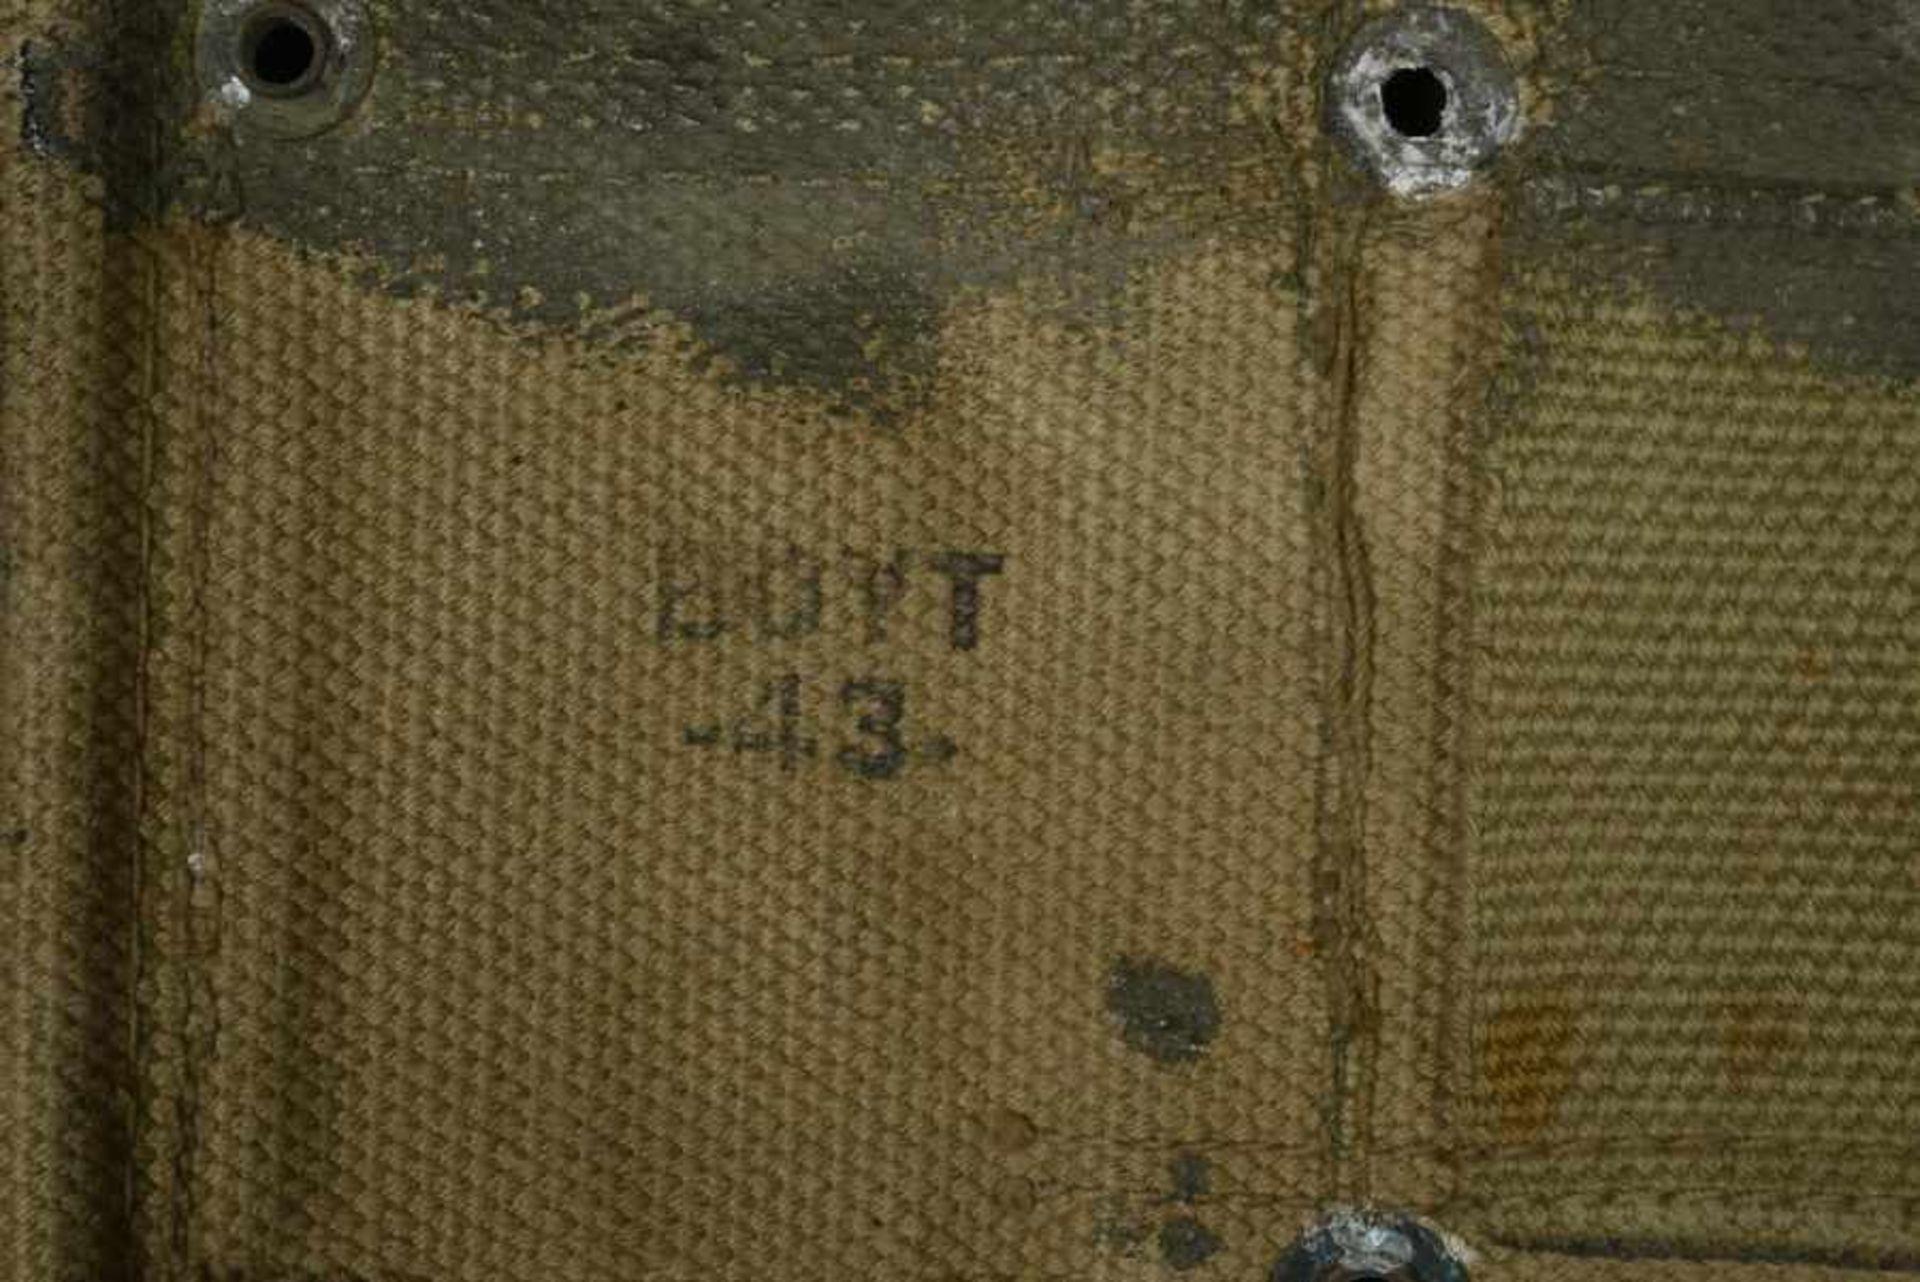 Ceinturon Garand camouflé. Camouflaged Garand Belt Ceinturon Garand en toile OD, peinture camouflé - Bild 3 aus 4